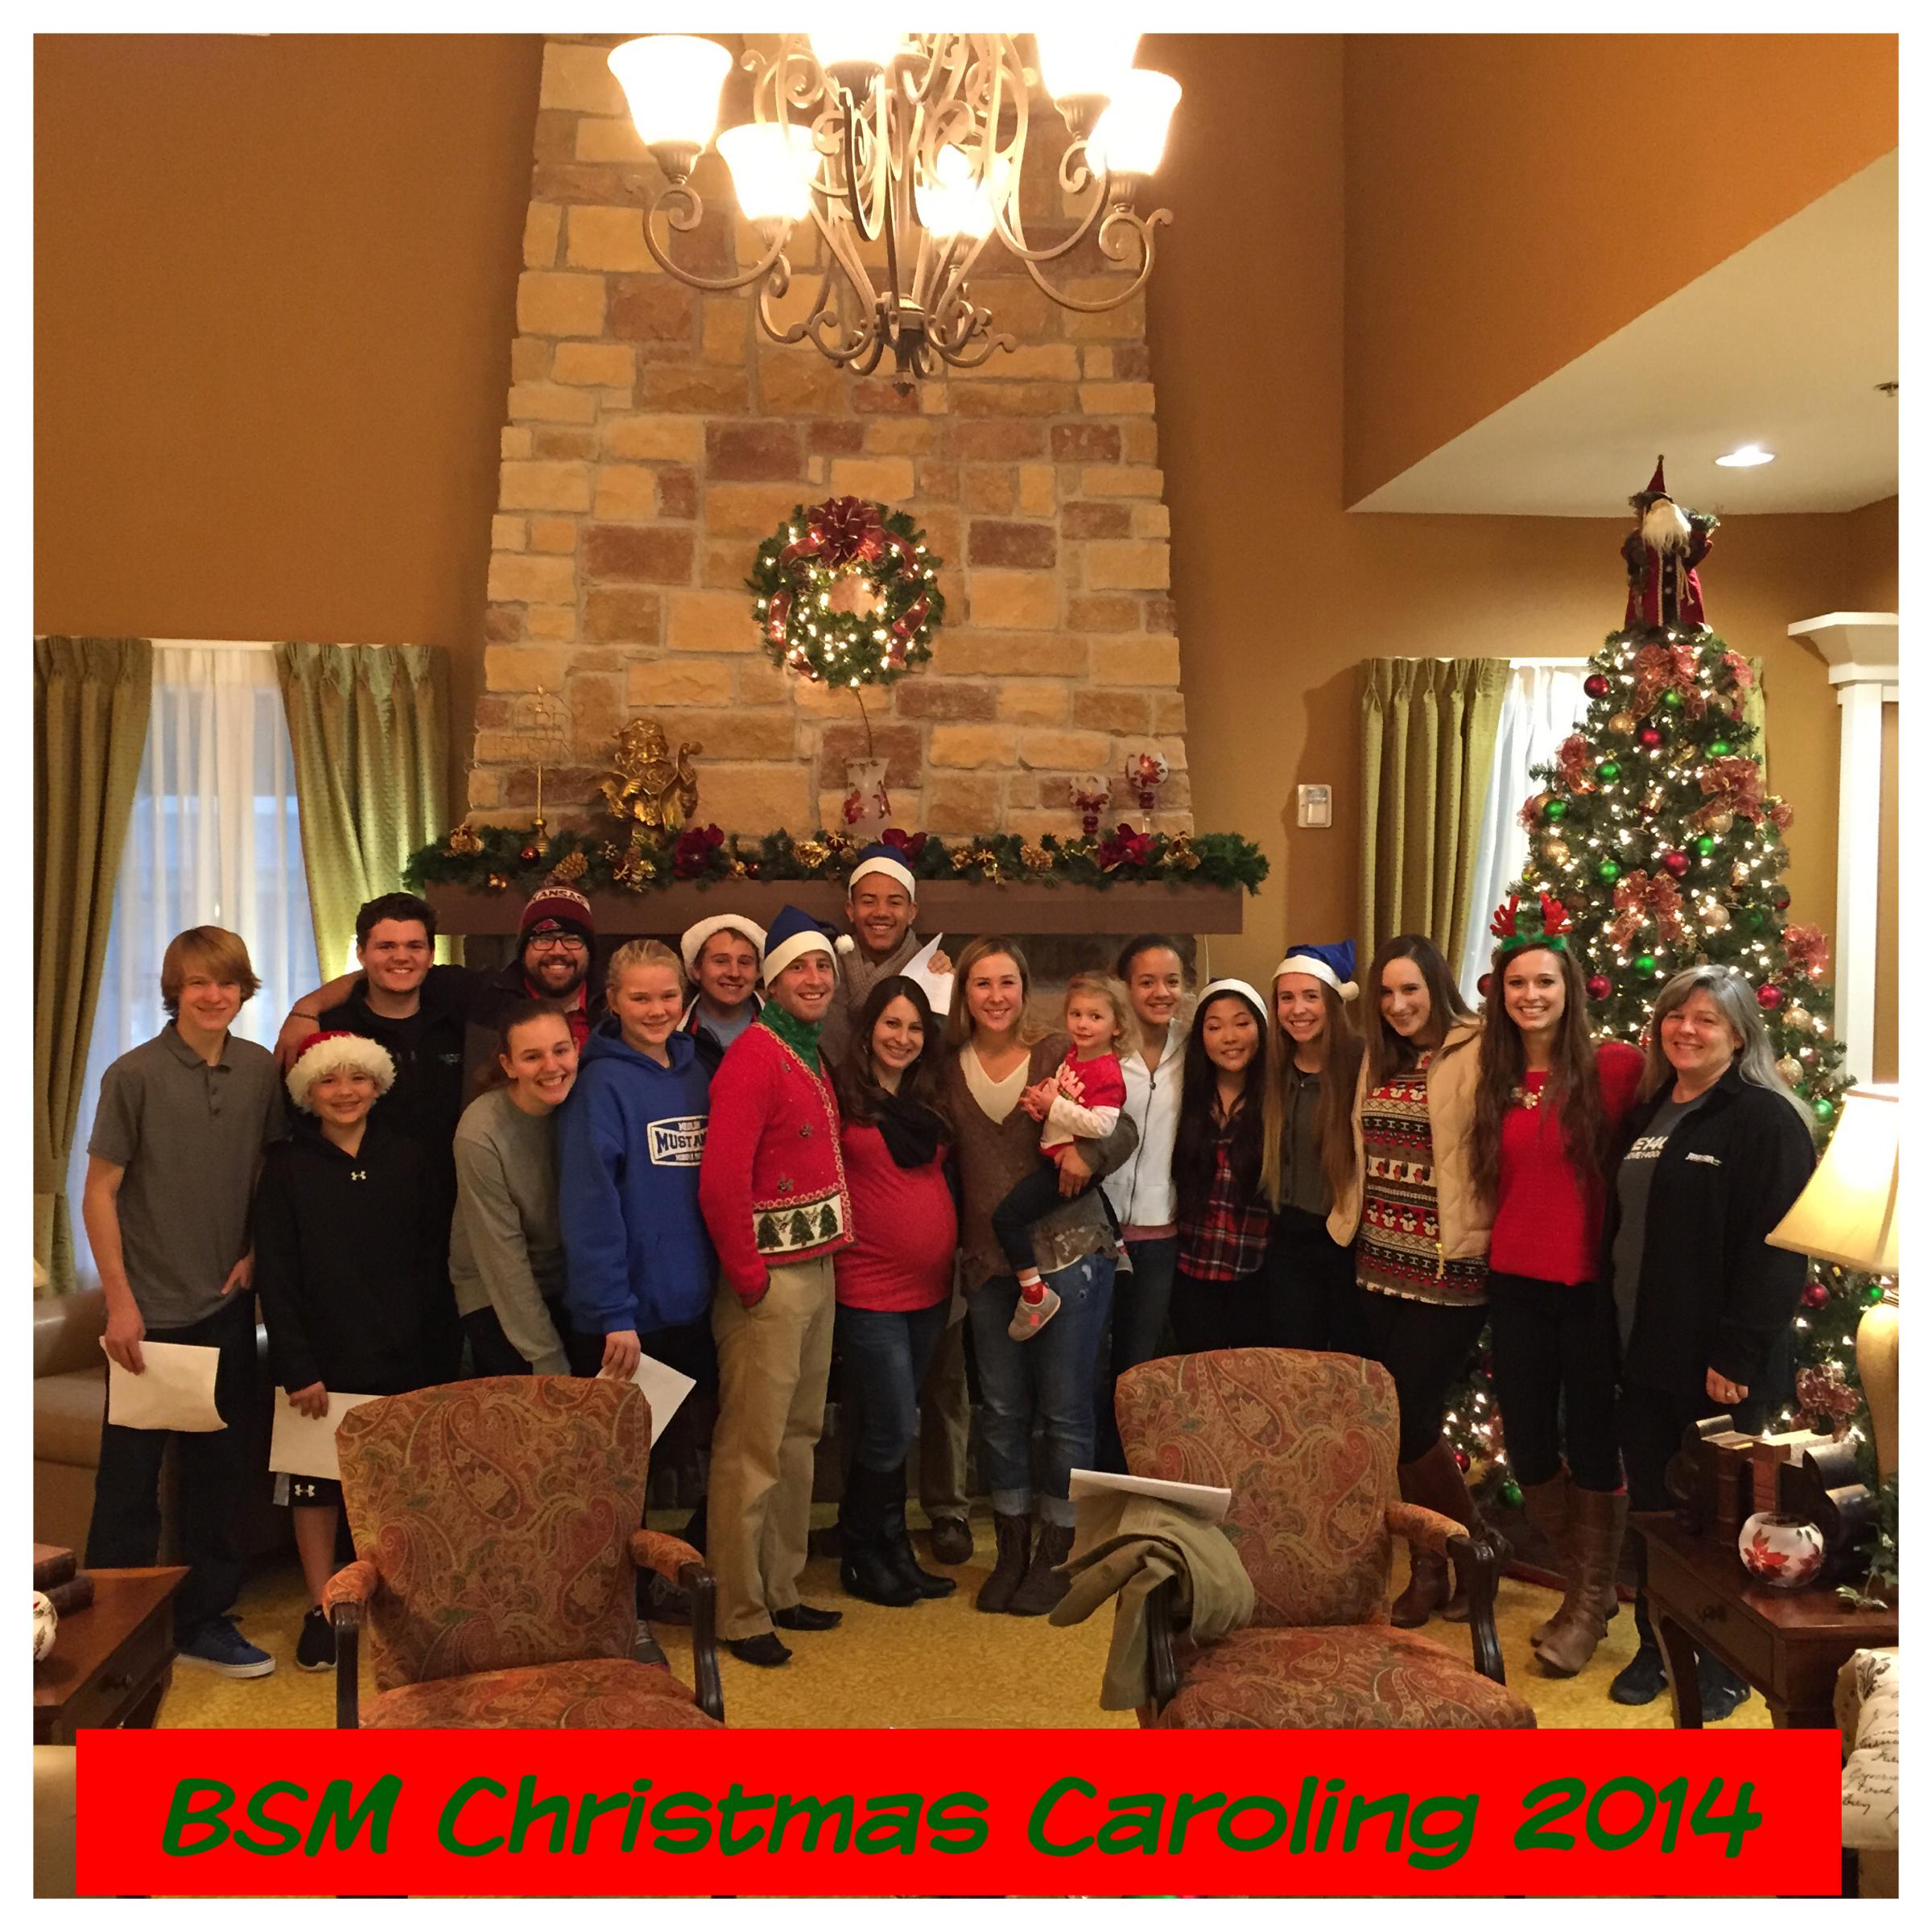 BSM Christmas Caroling 2014.jpg